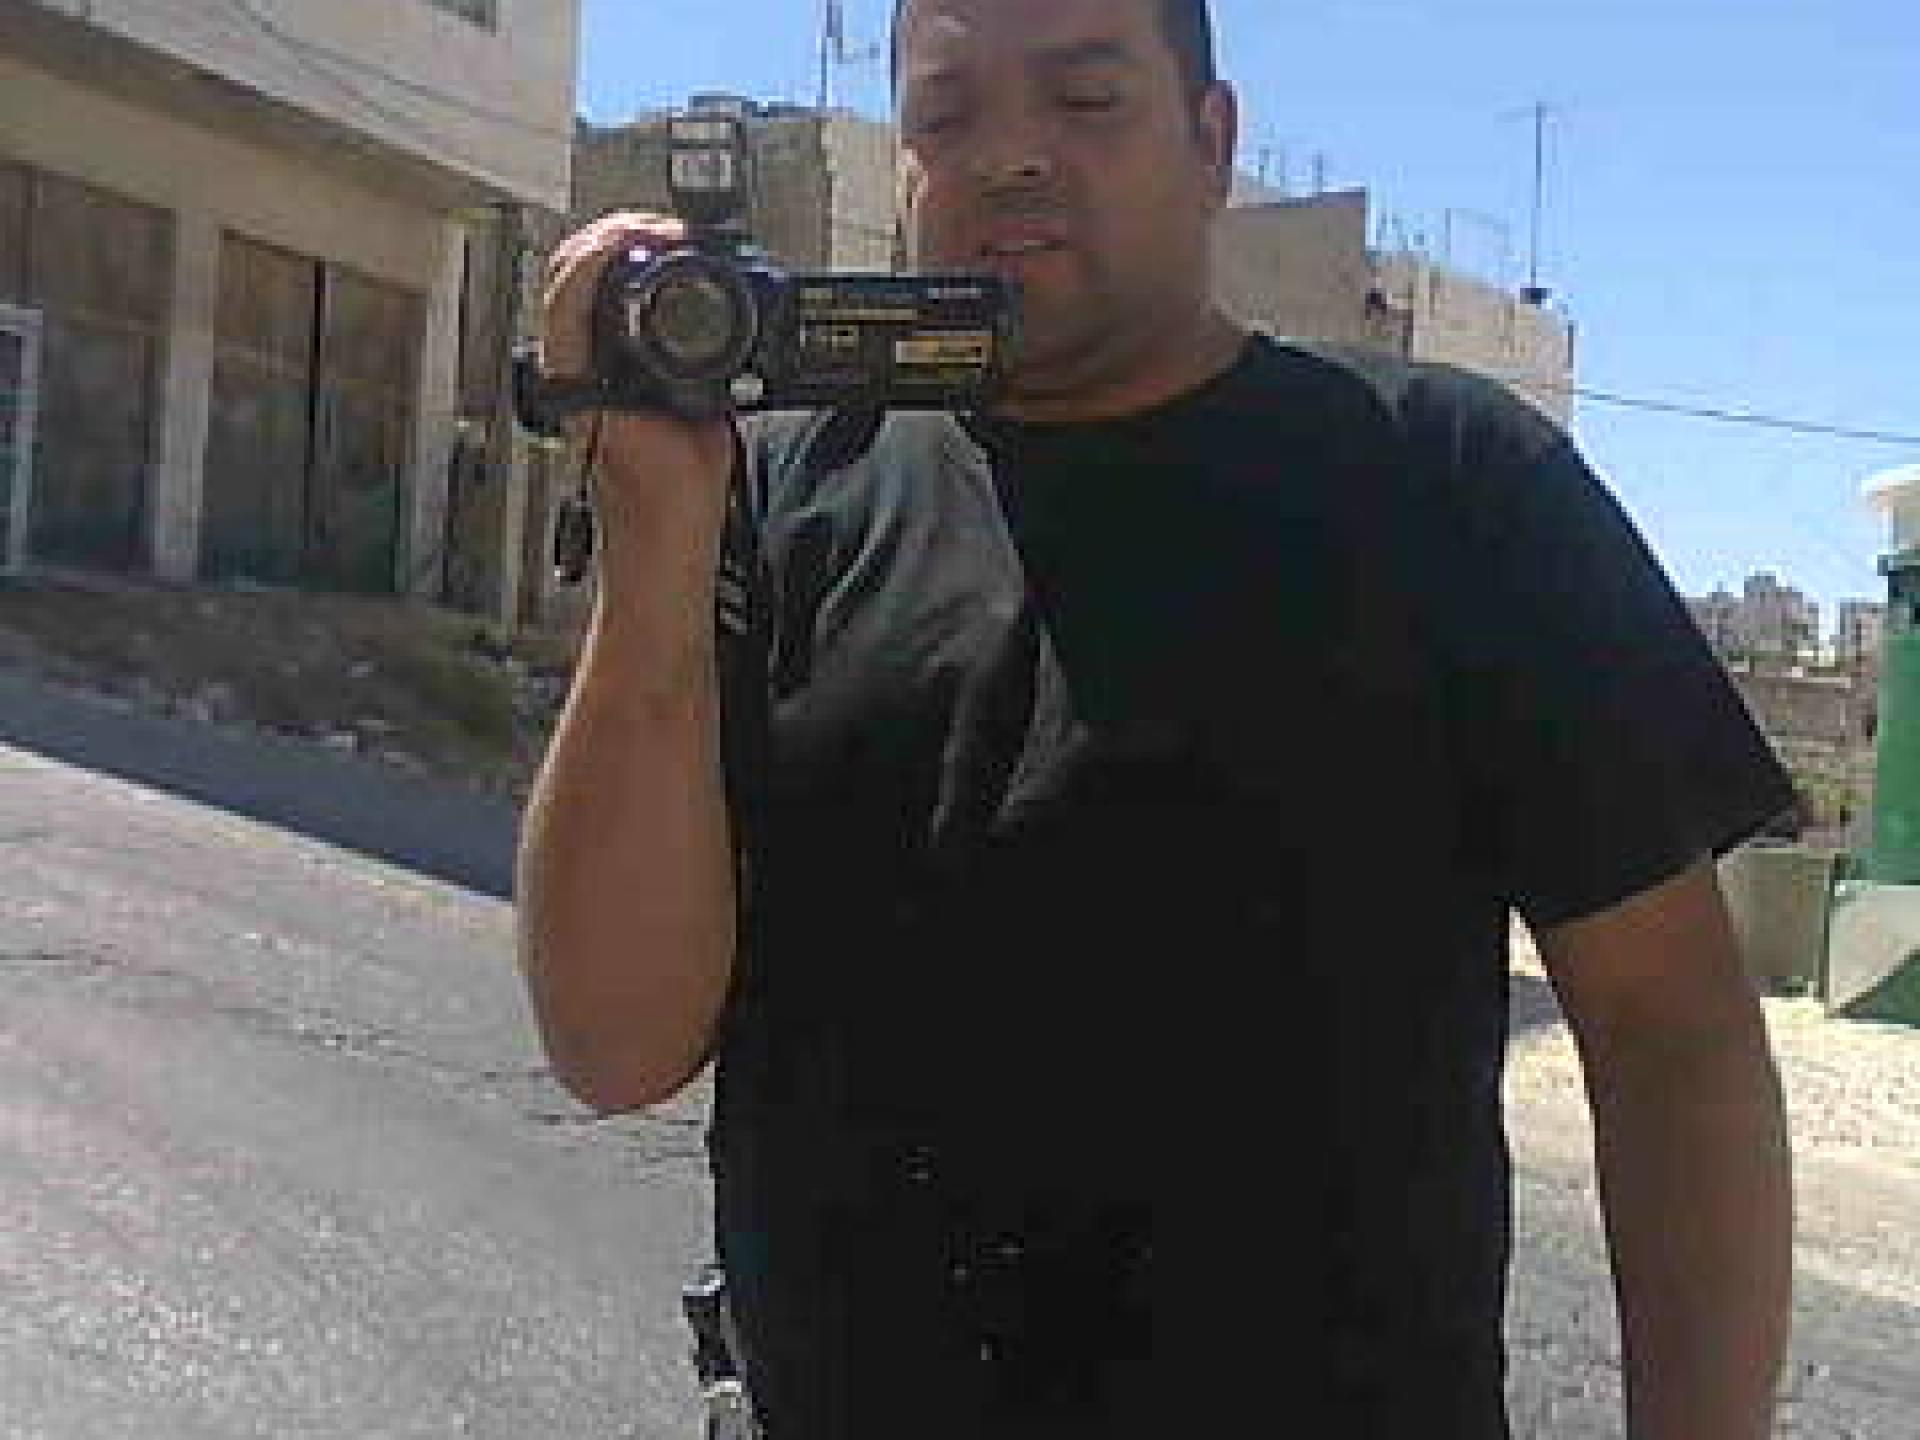 Hebron 01.06.09